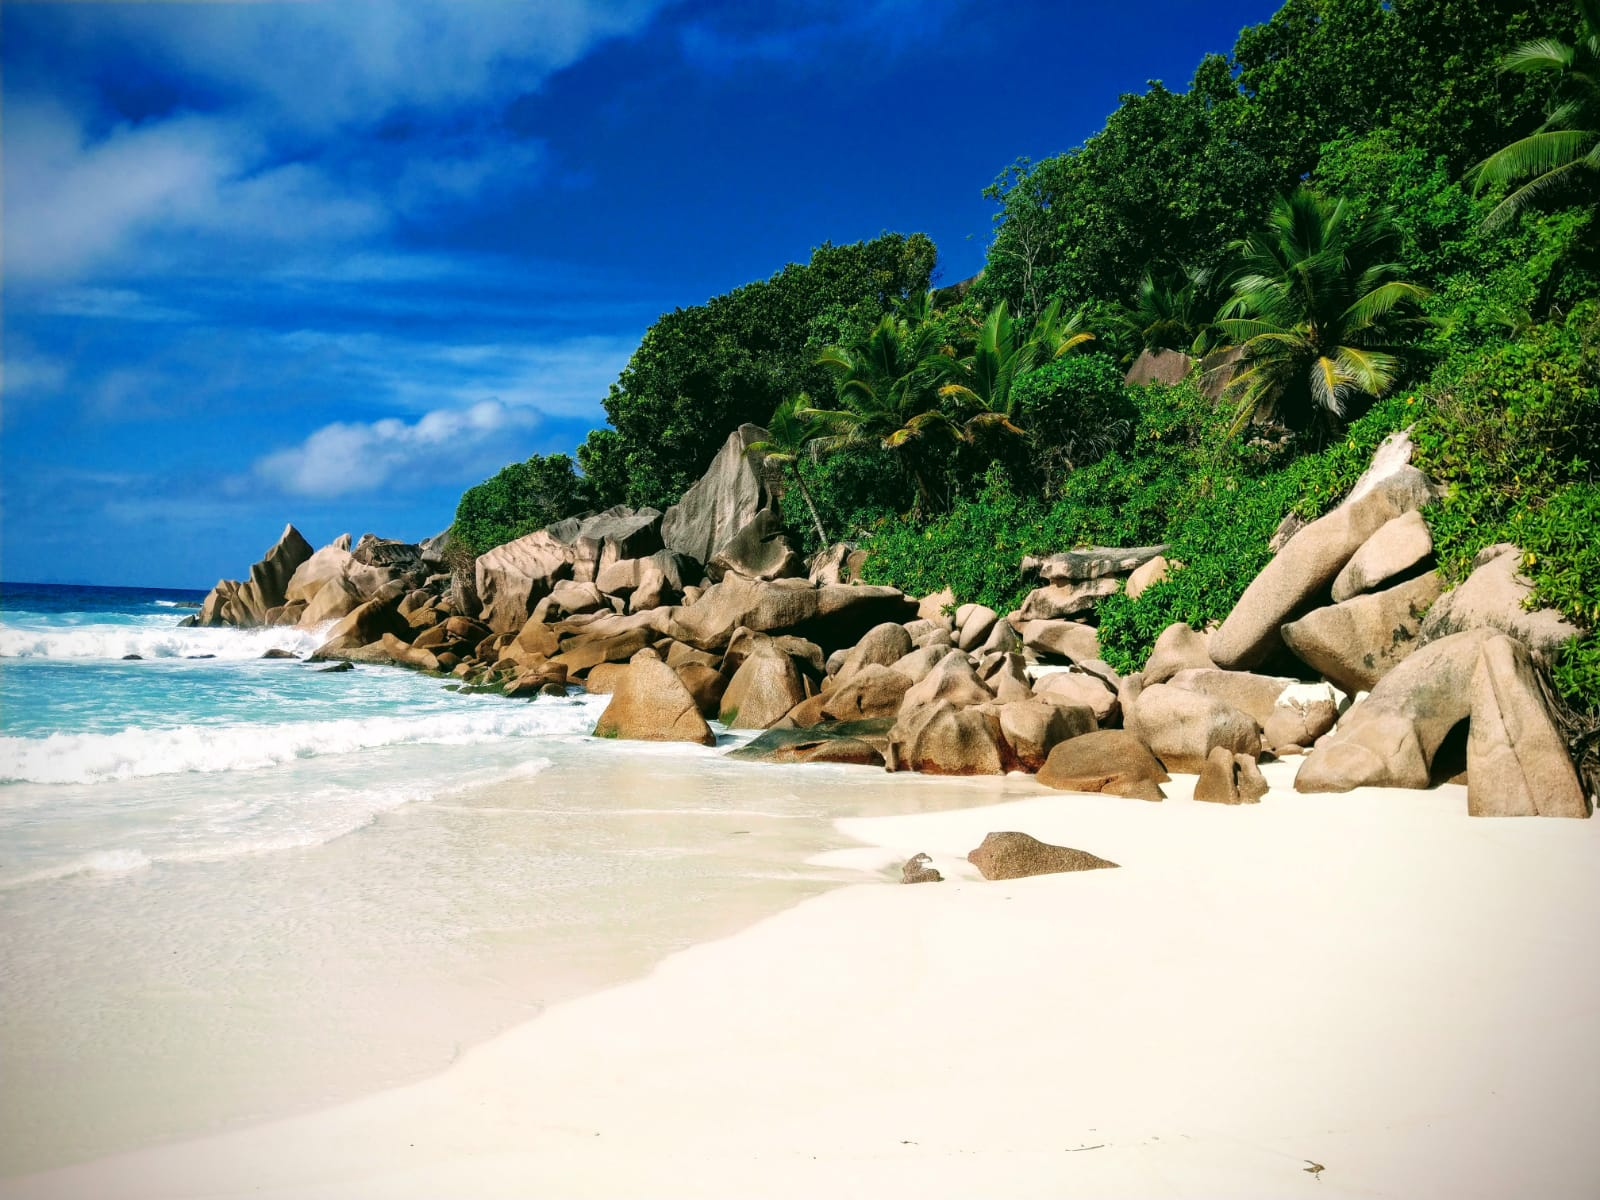 tourameo-reiseplanung-reiseziel-seychellen-strand